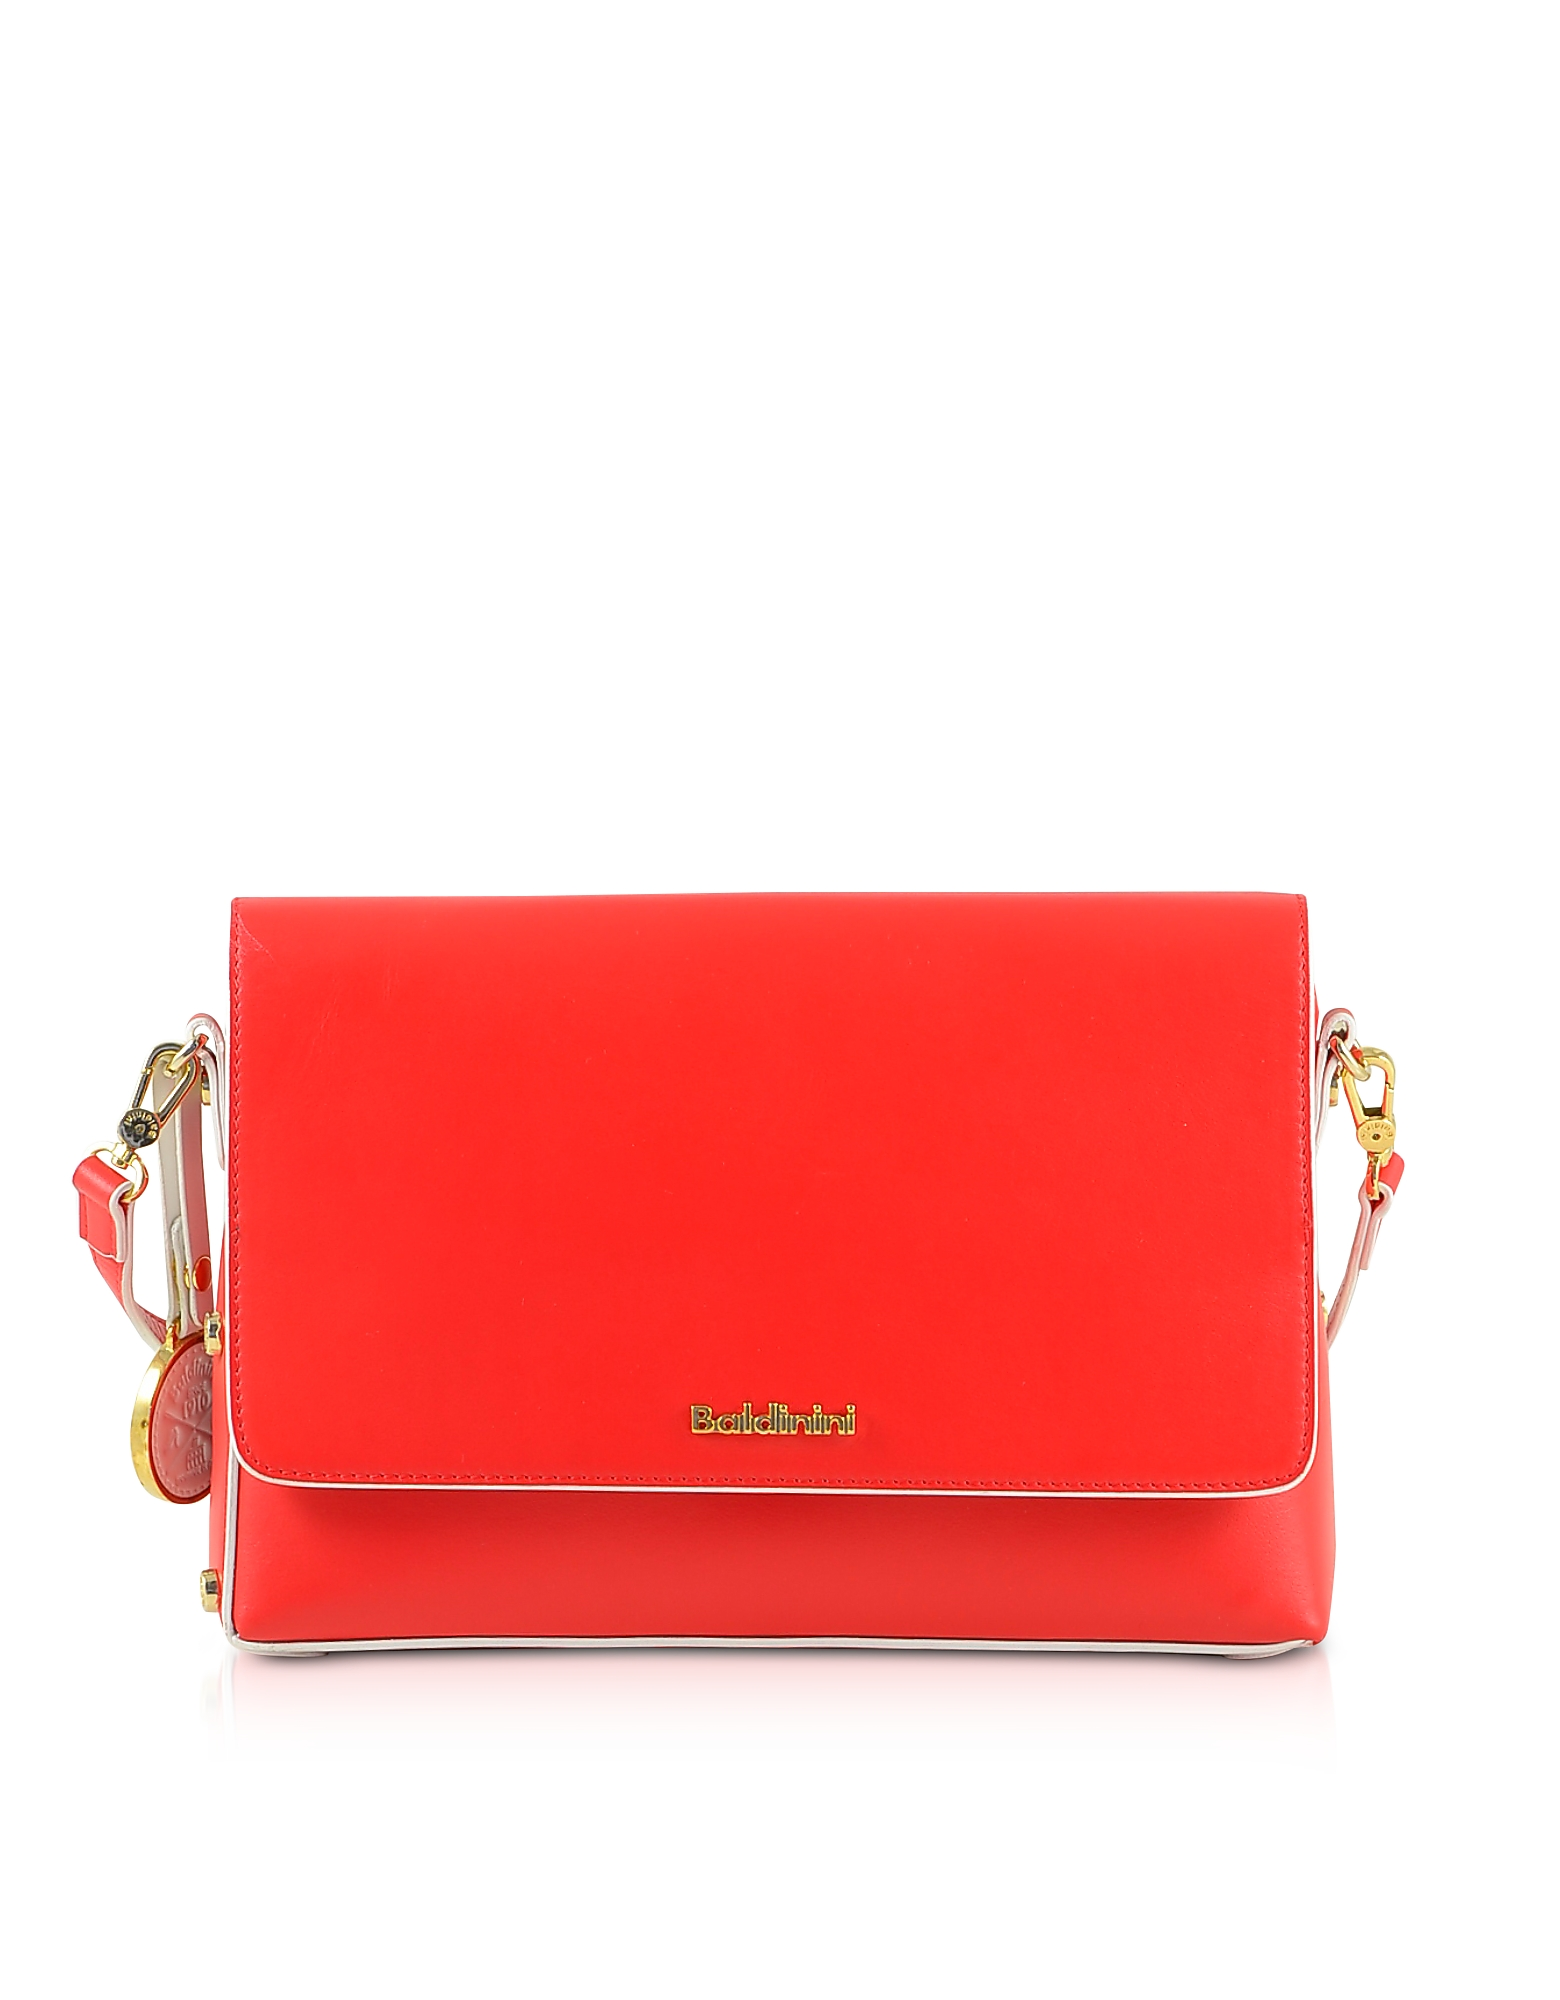 Baldinini Designer Handbags, Red Eco-Leather Shoulder Bag